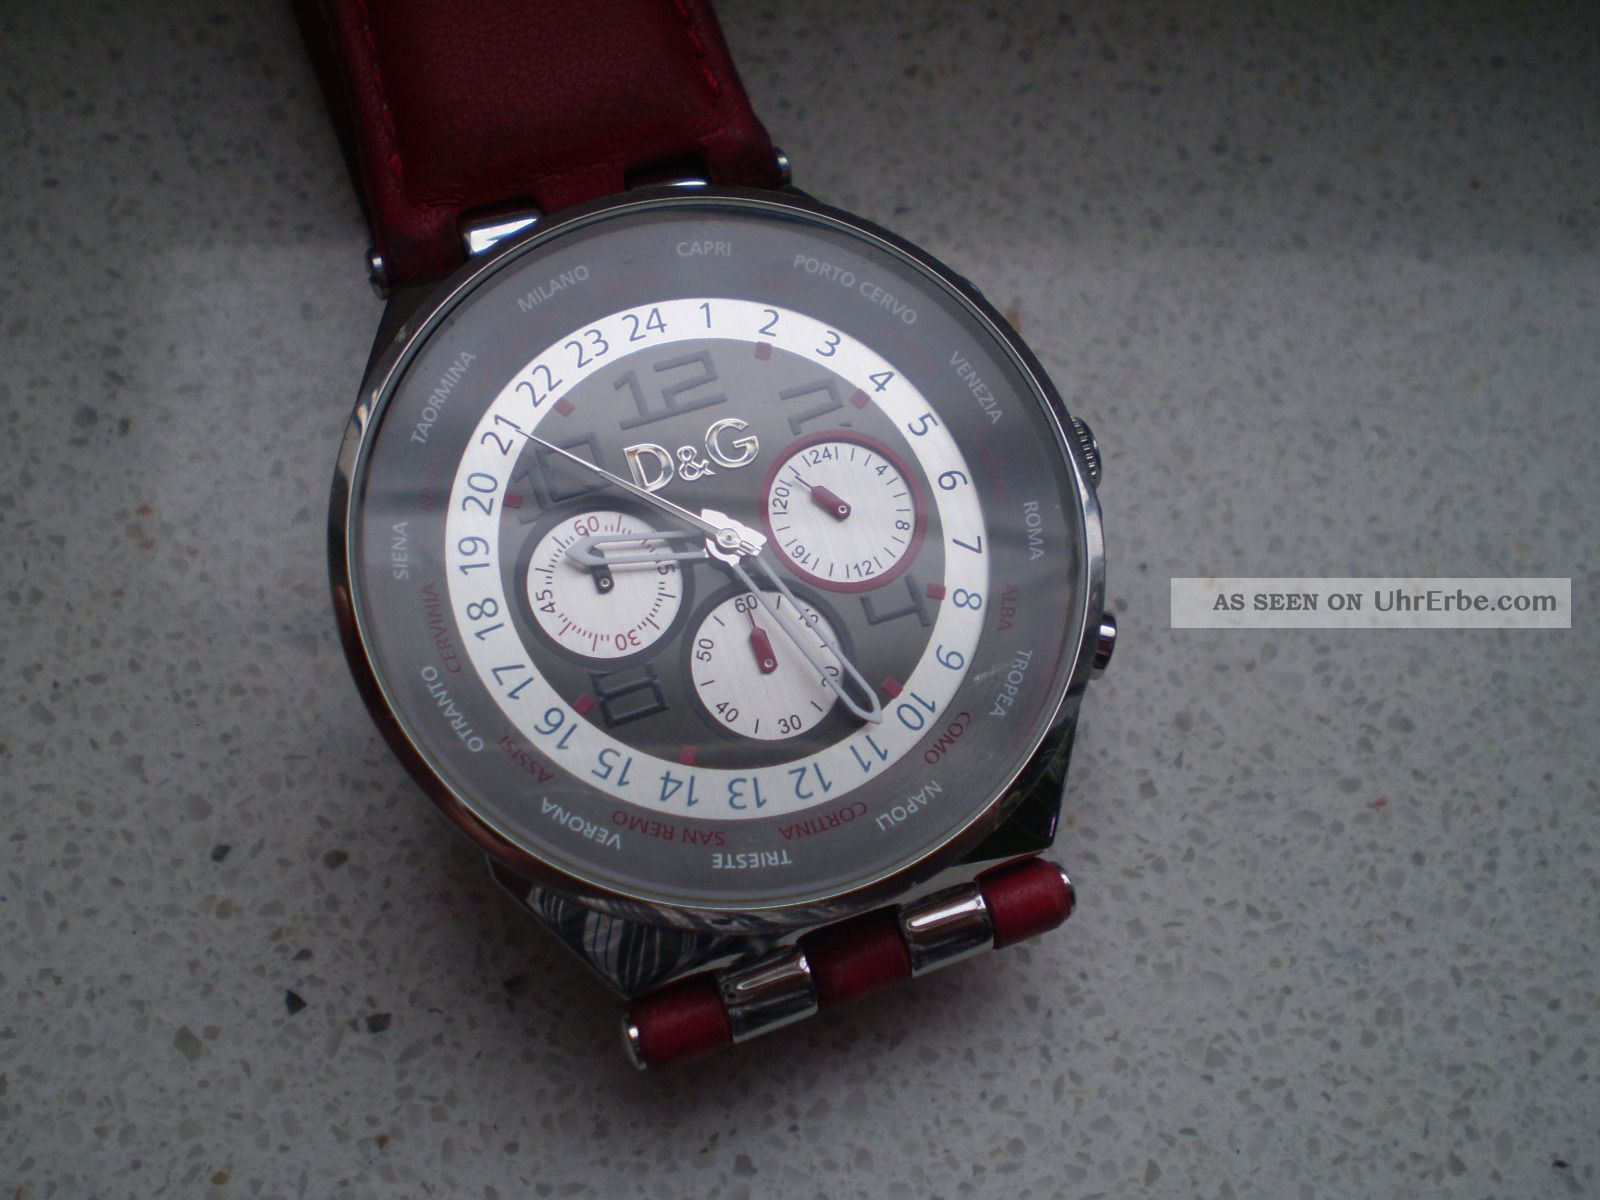 Dolce & Gabbana D&g Herren Chronograph Läuft - Armbanduhren Bild